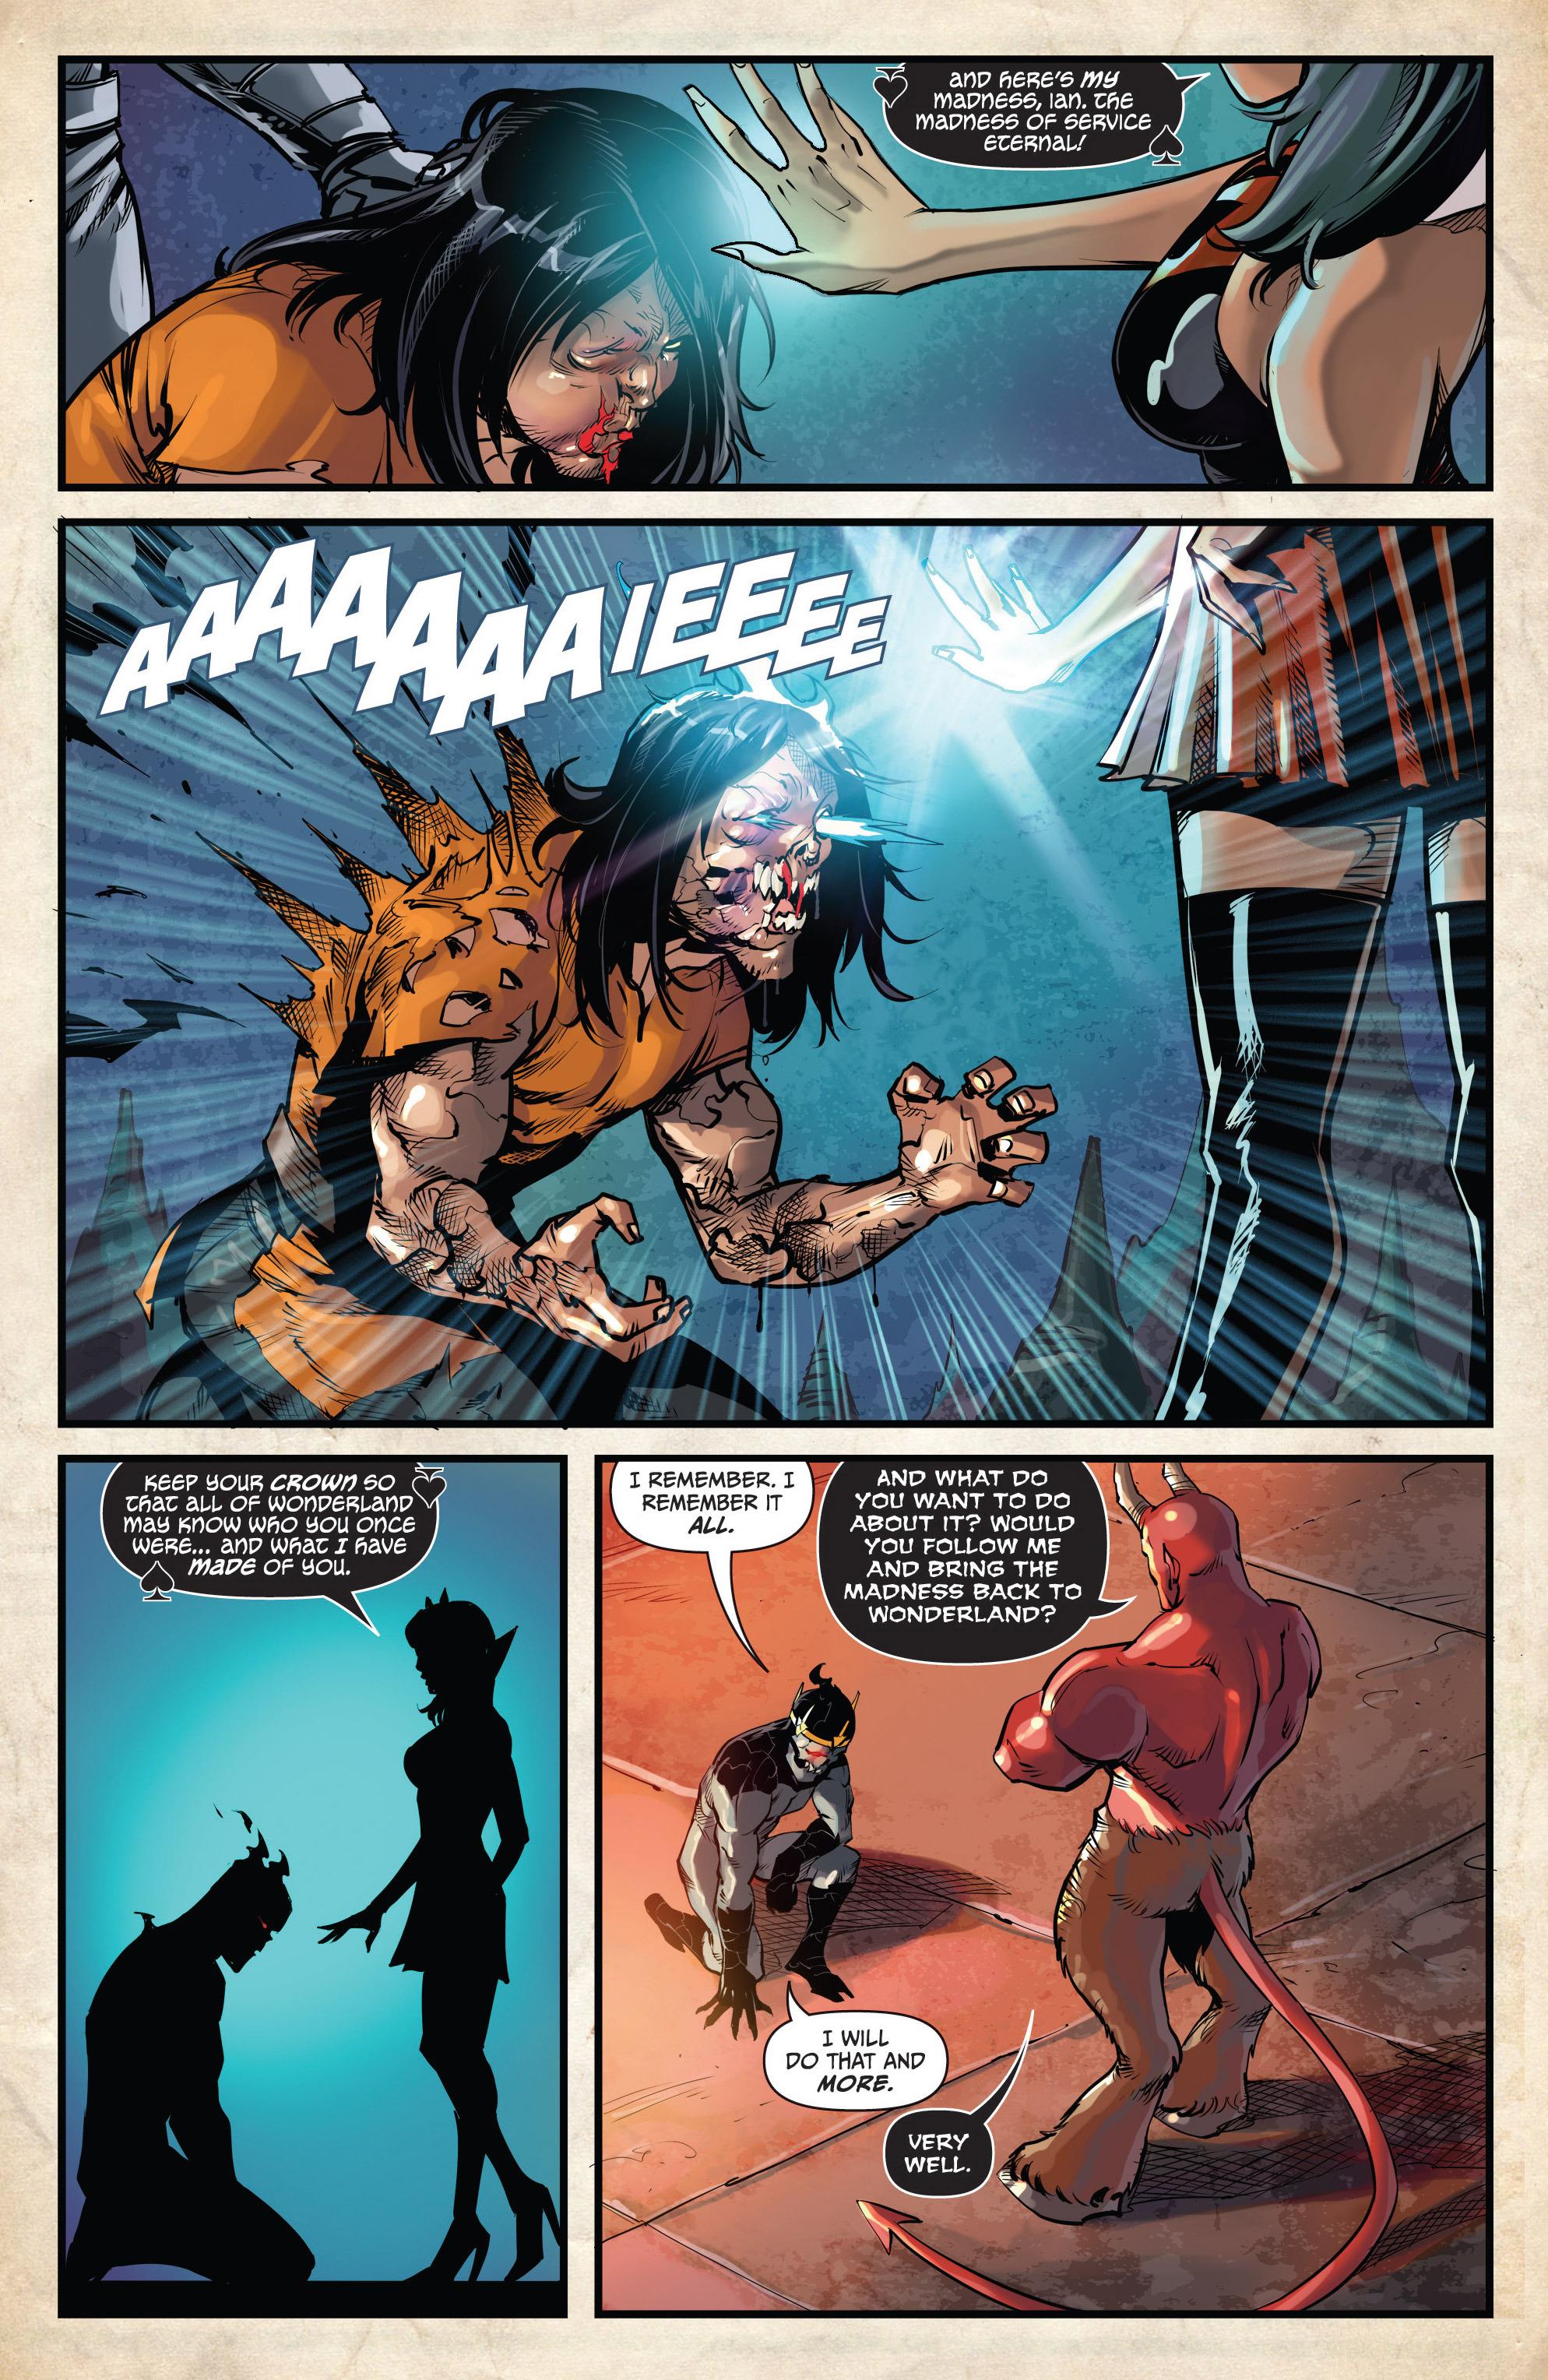 Read online Grimm Fairy Tales vs. Wonderland comic -  Issue #3 - 17